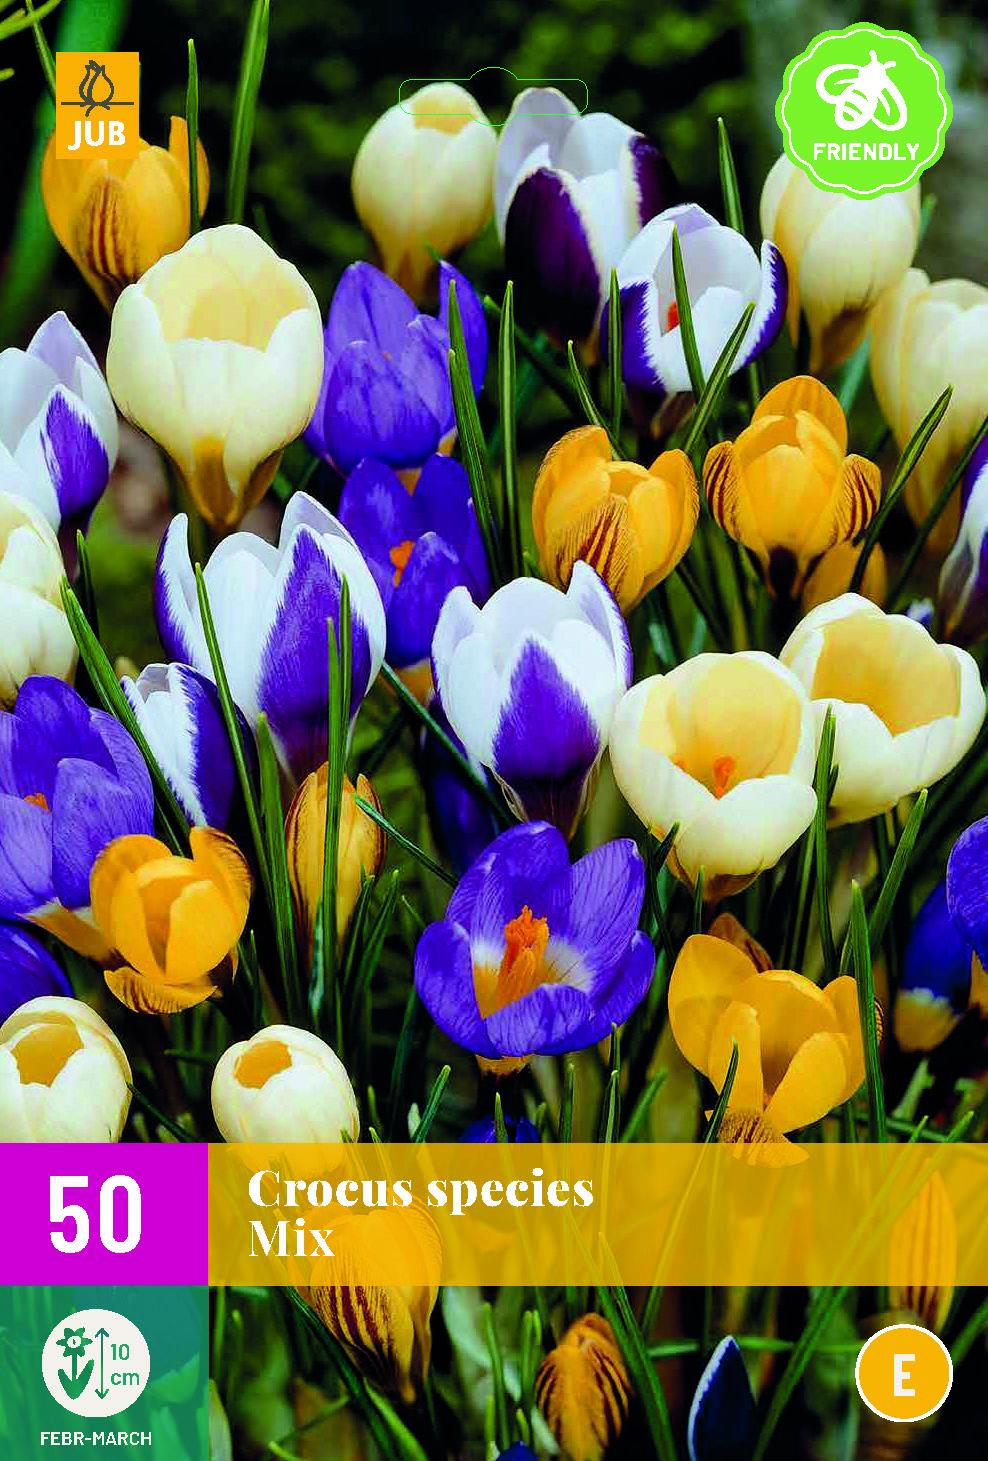 CROCUS SPECIES MIX 50